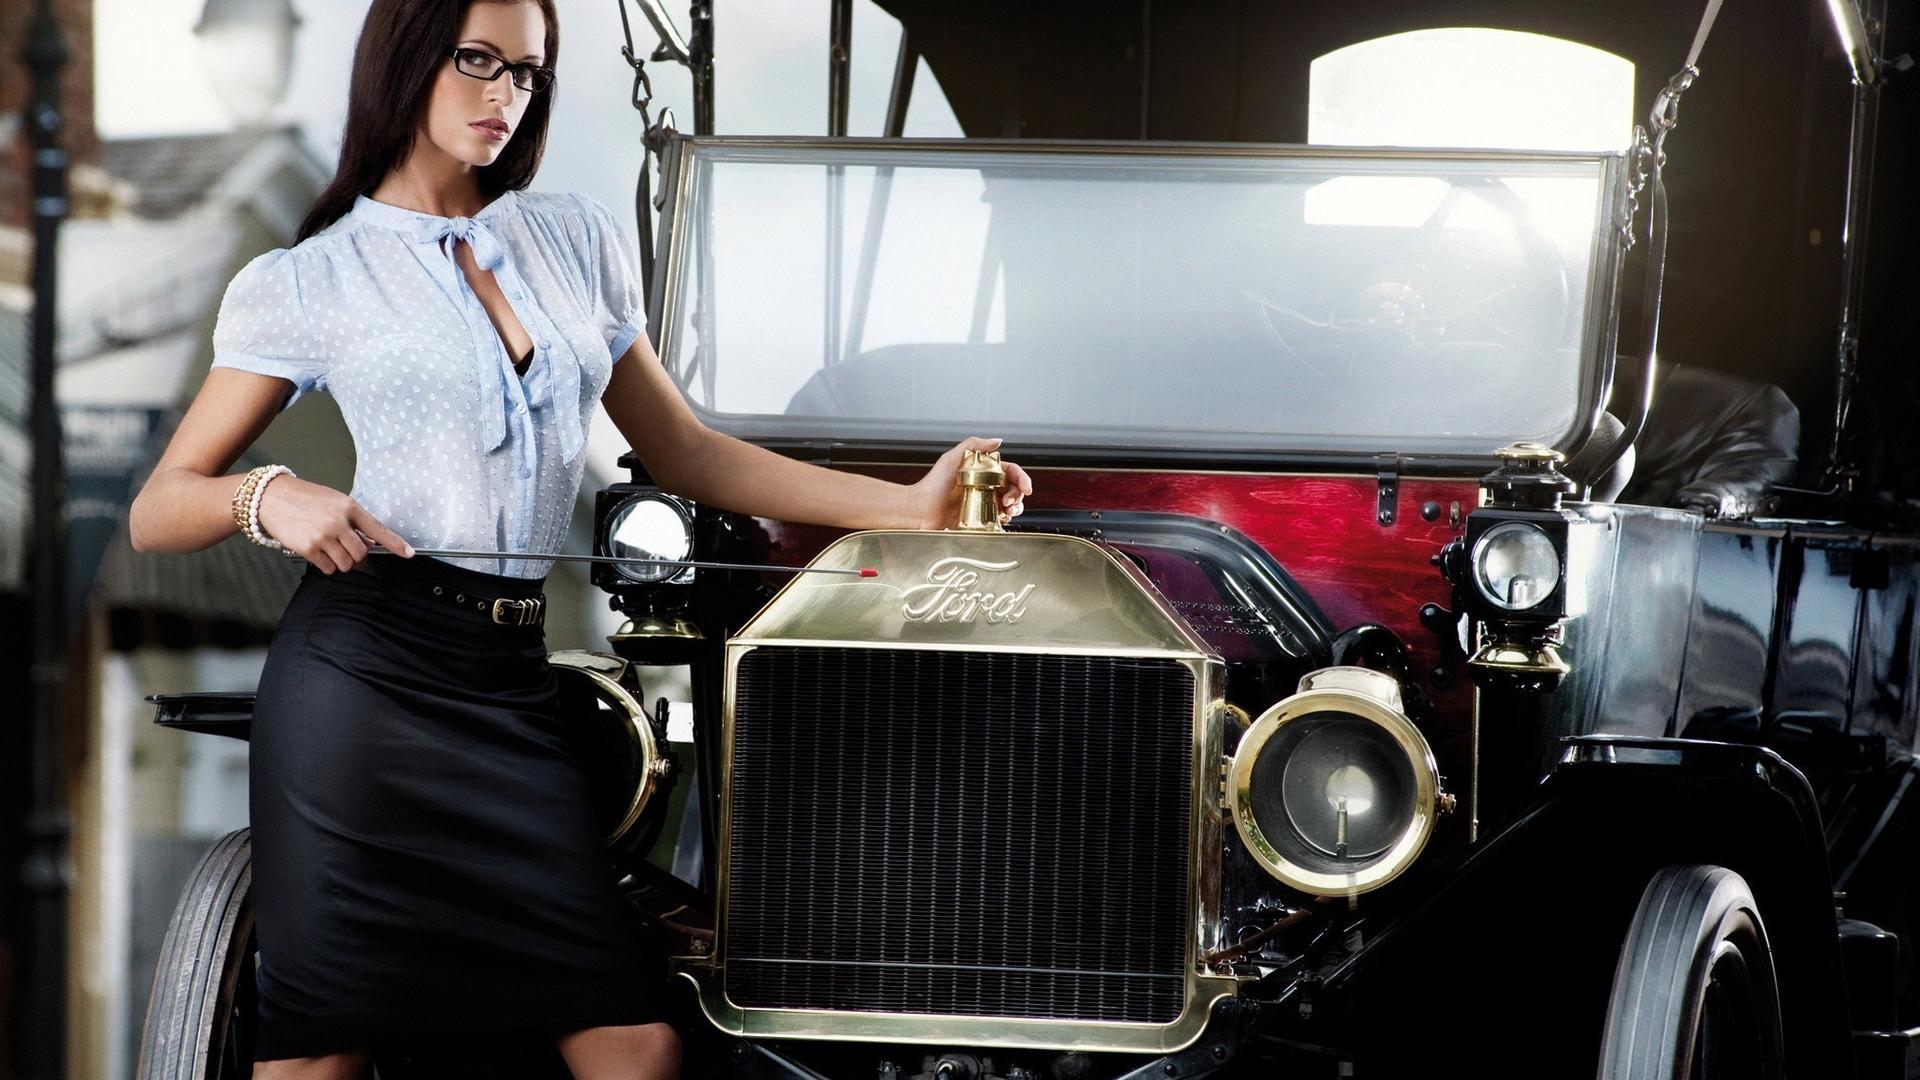 Авто и девушки в юбках фото